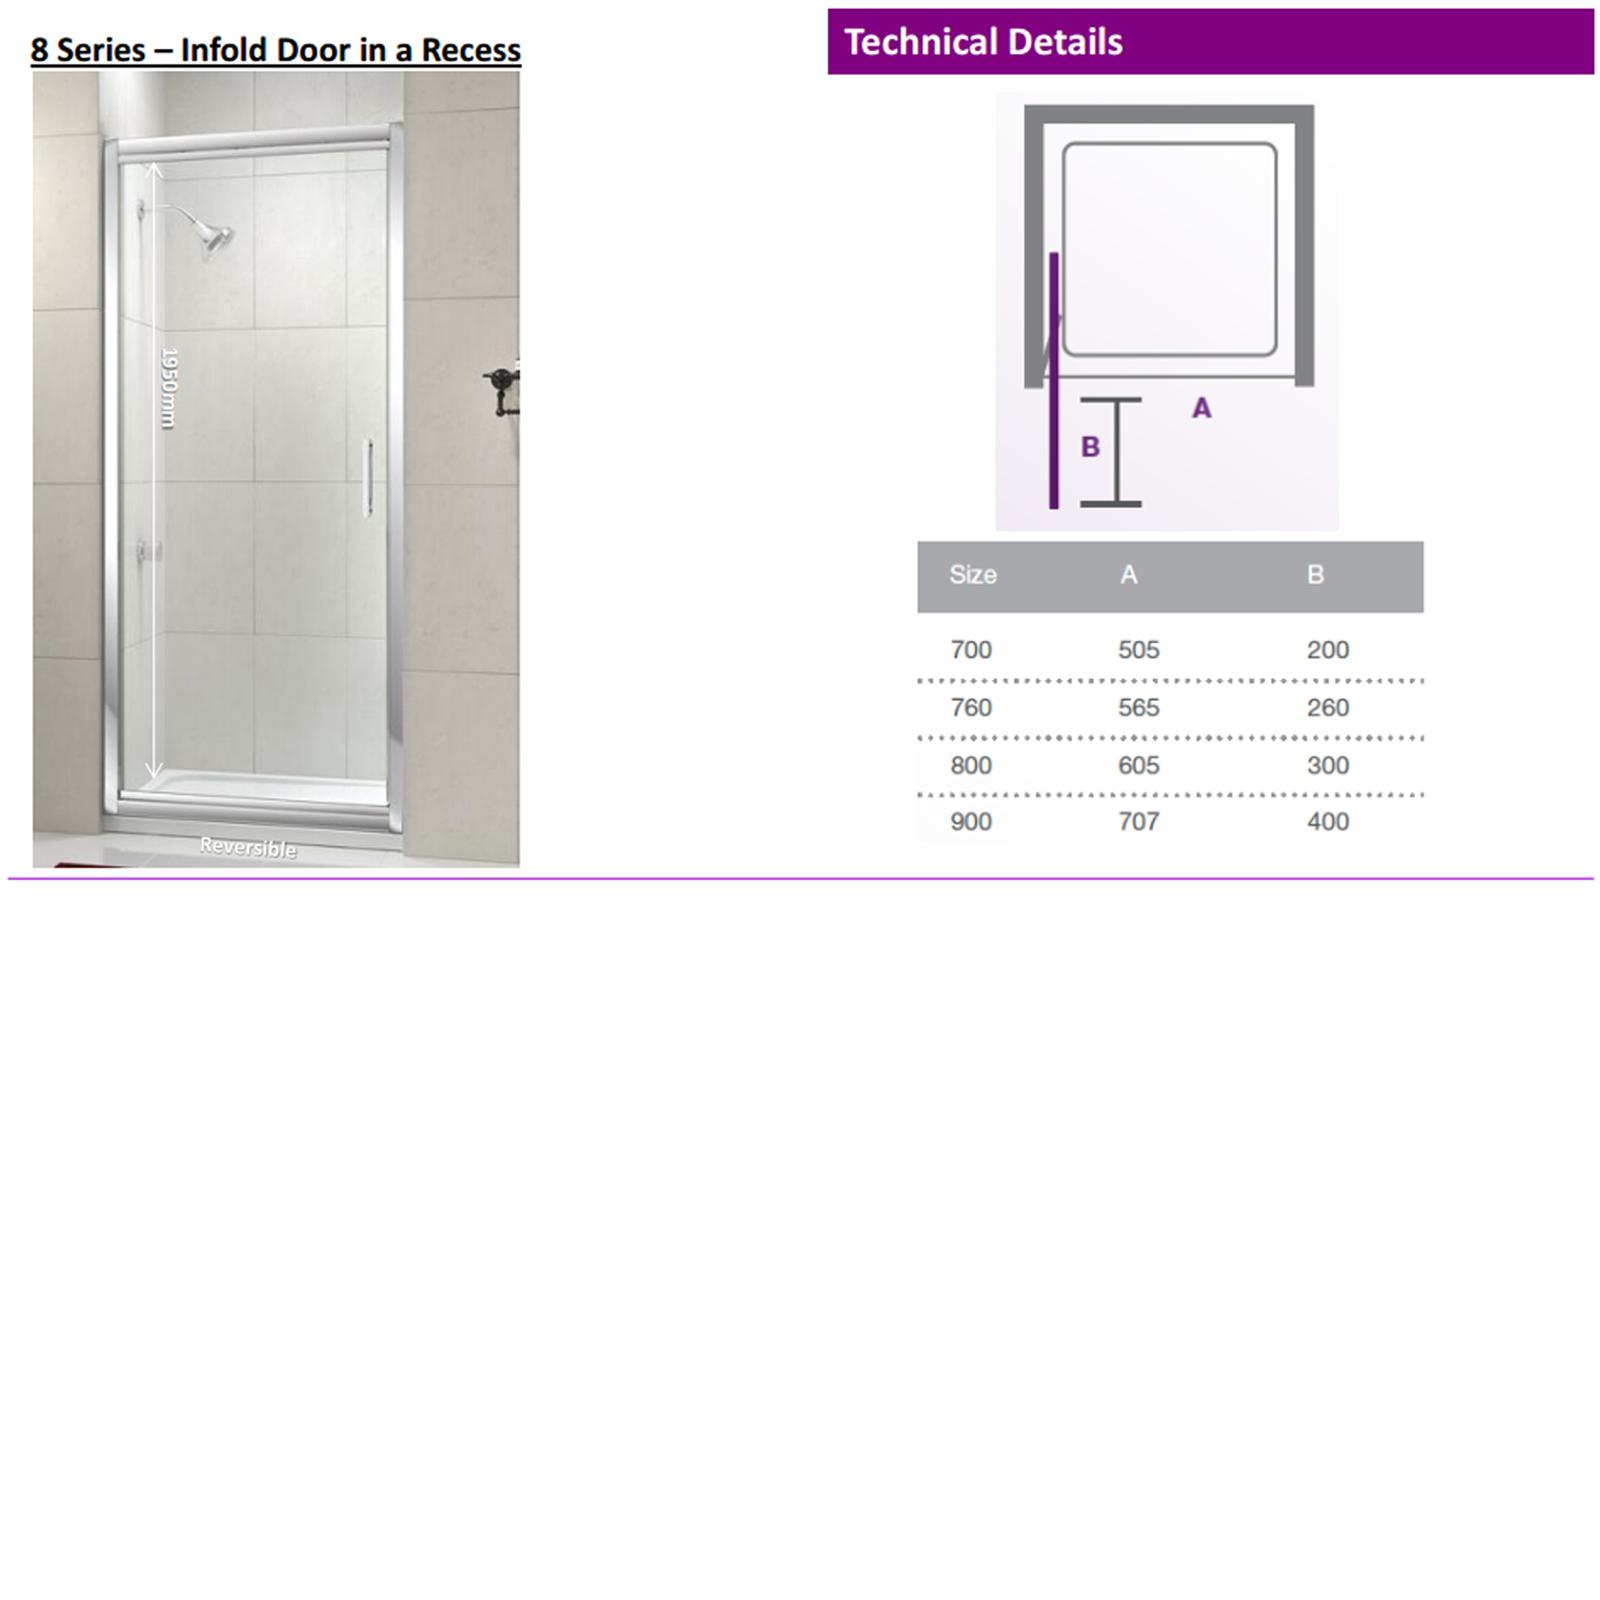 Merlyn series 8 infold door 1000mm at allbits for 1000mm door